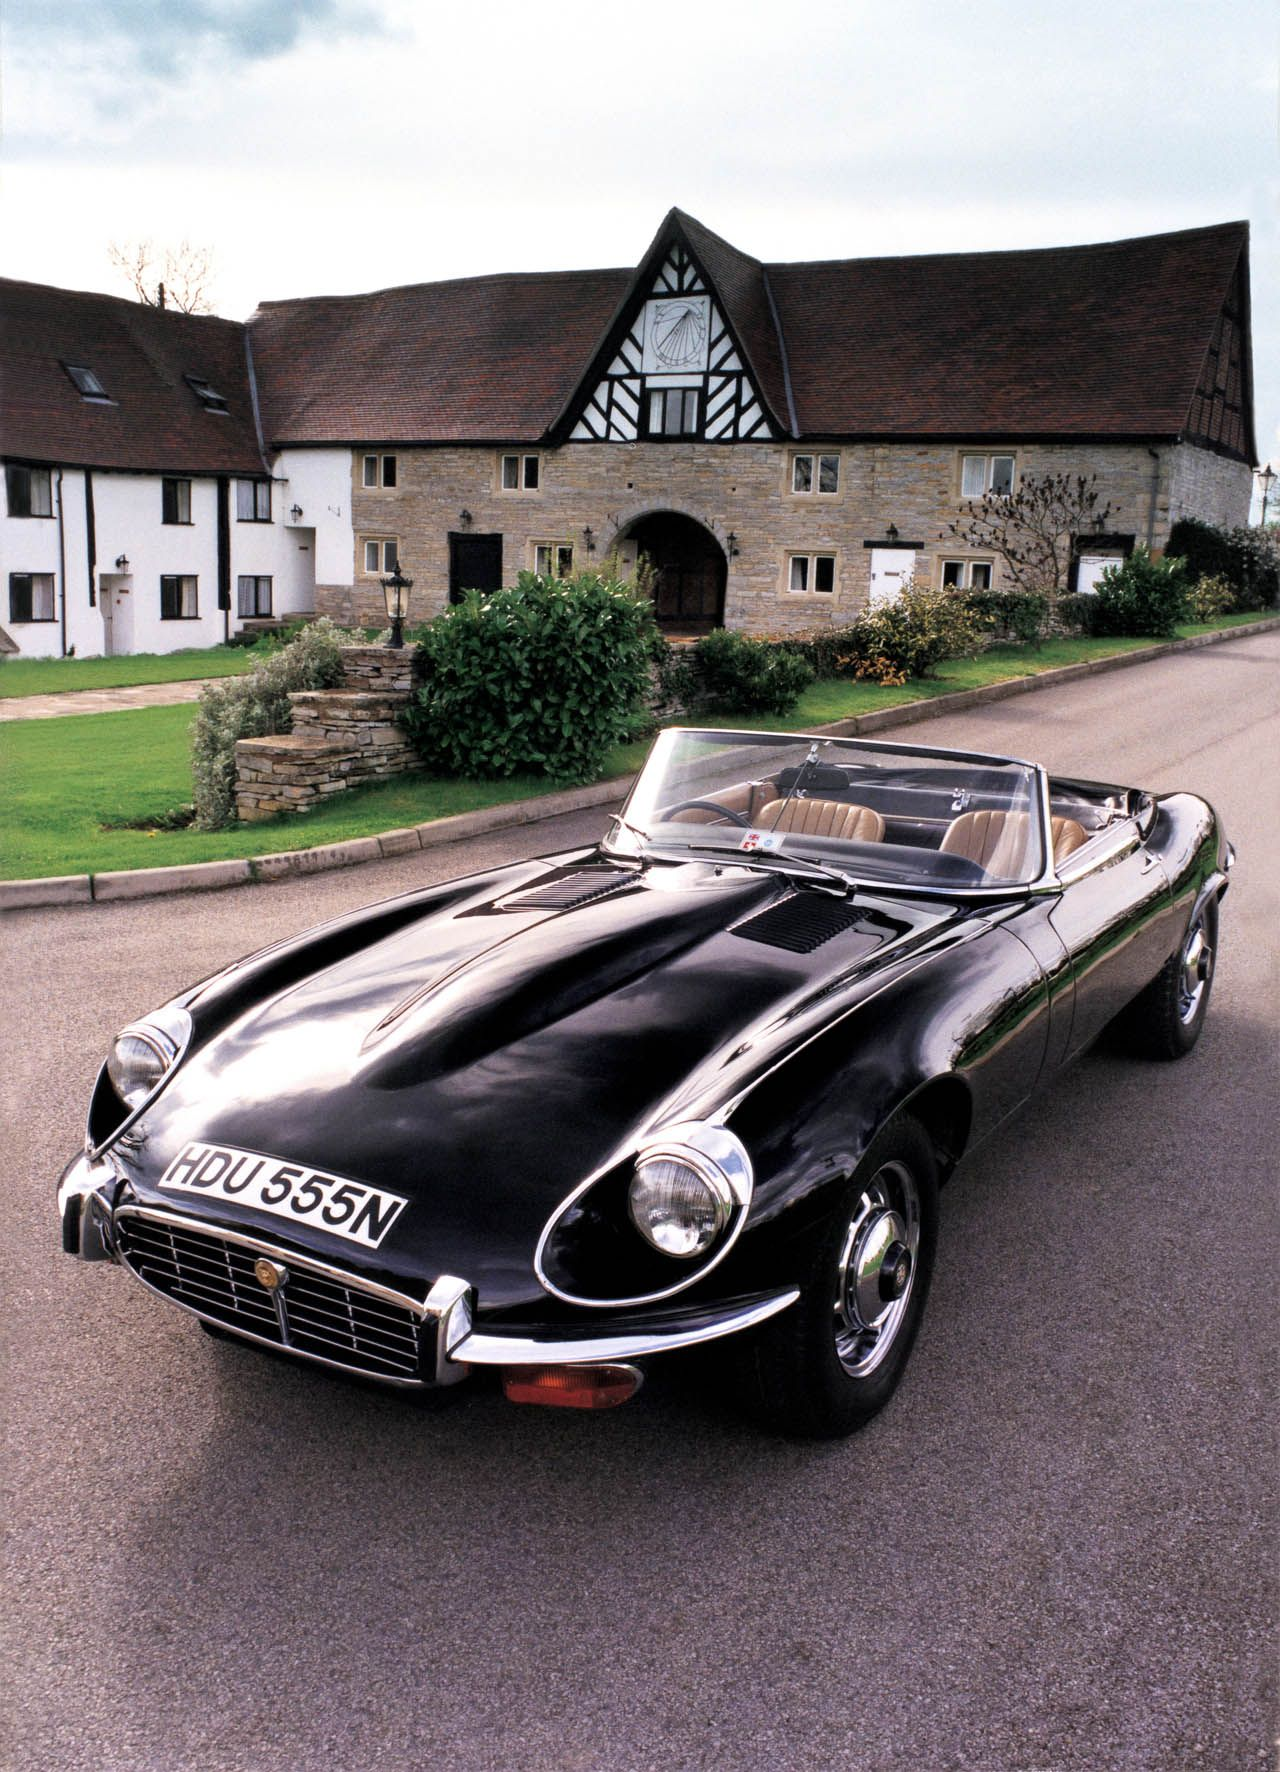 Jaguar driving gloves uk - 1961 Jaguar E Type Repin By At Social Media Marketing Pinterest Marketing Specialists